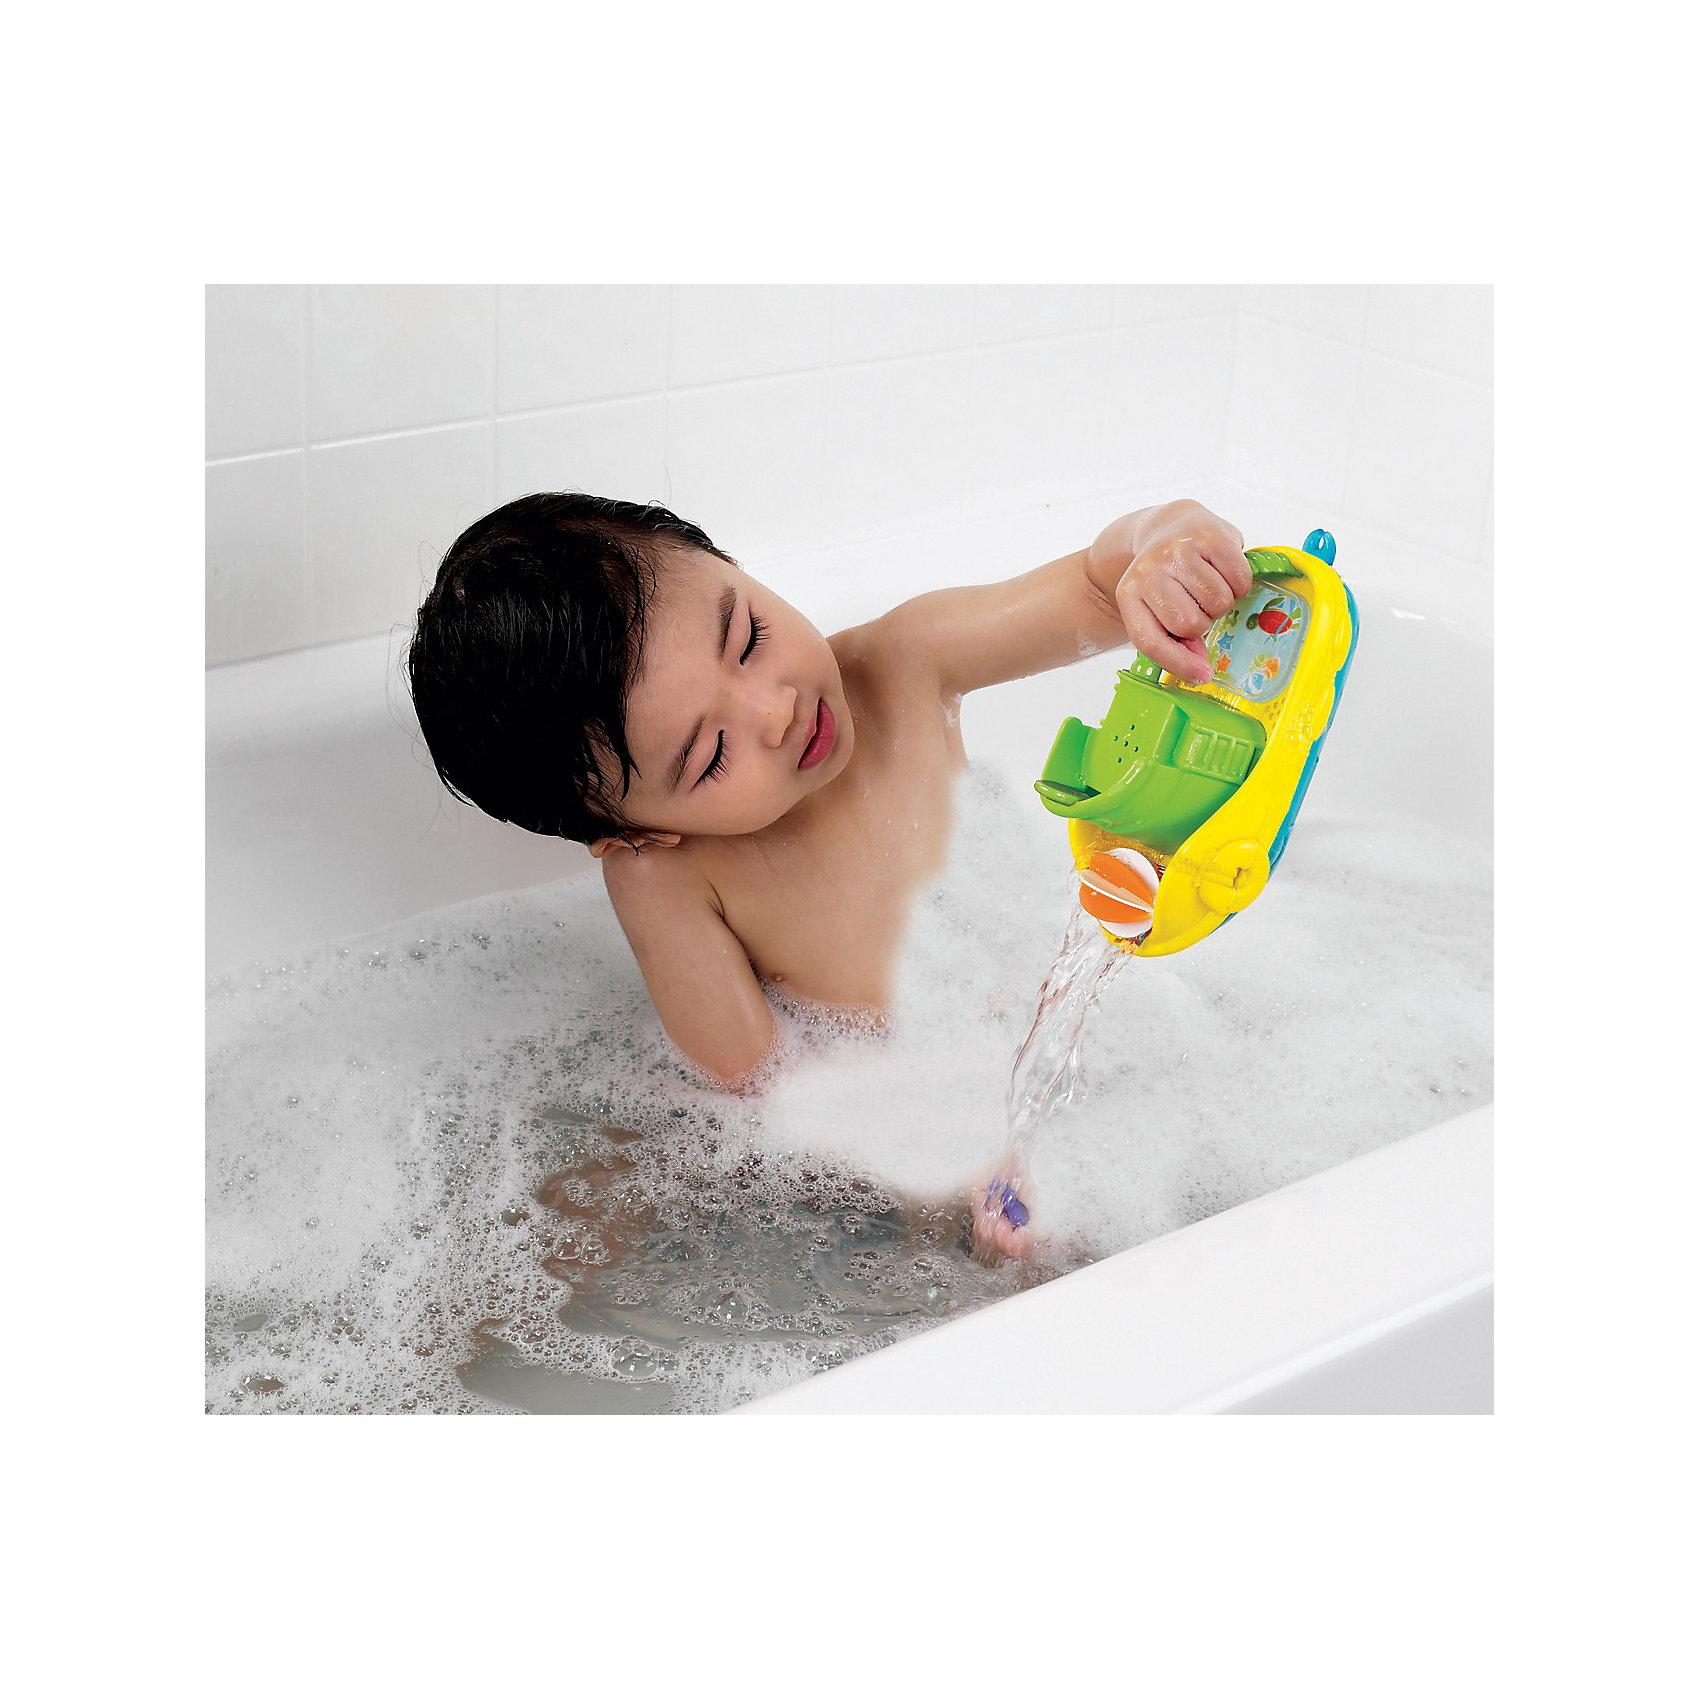 Игрушки для ванны Весёлая лодочка, Munchkin от myToys